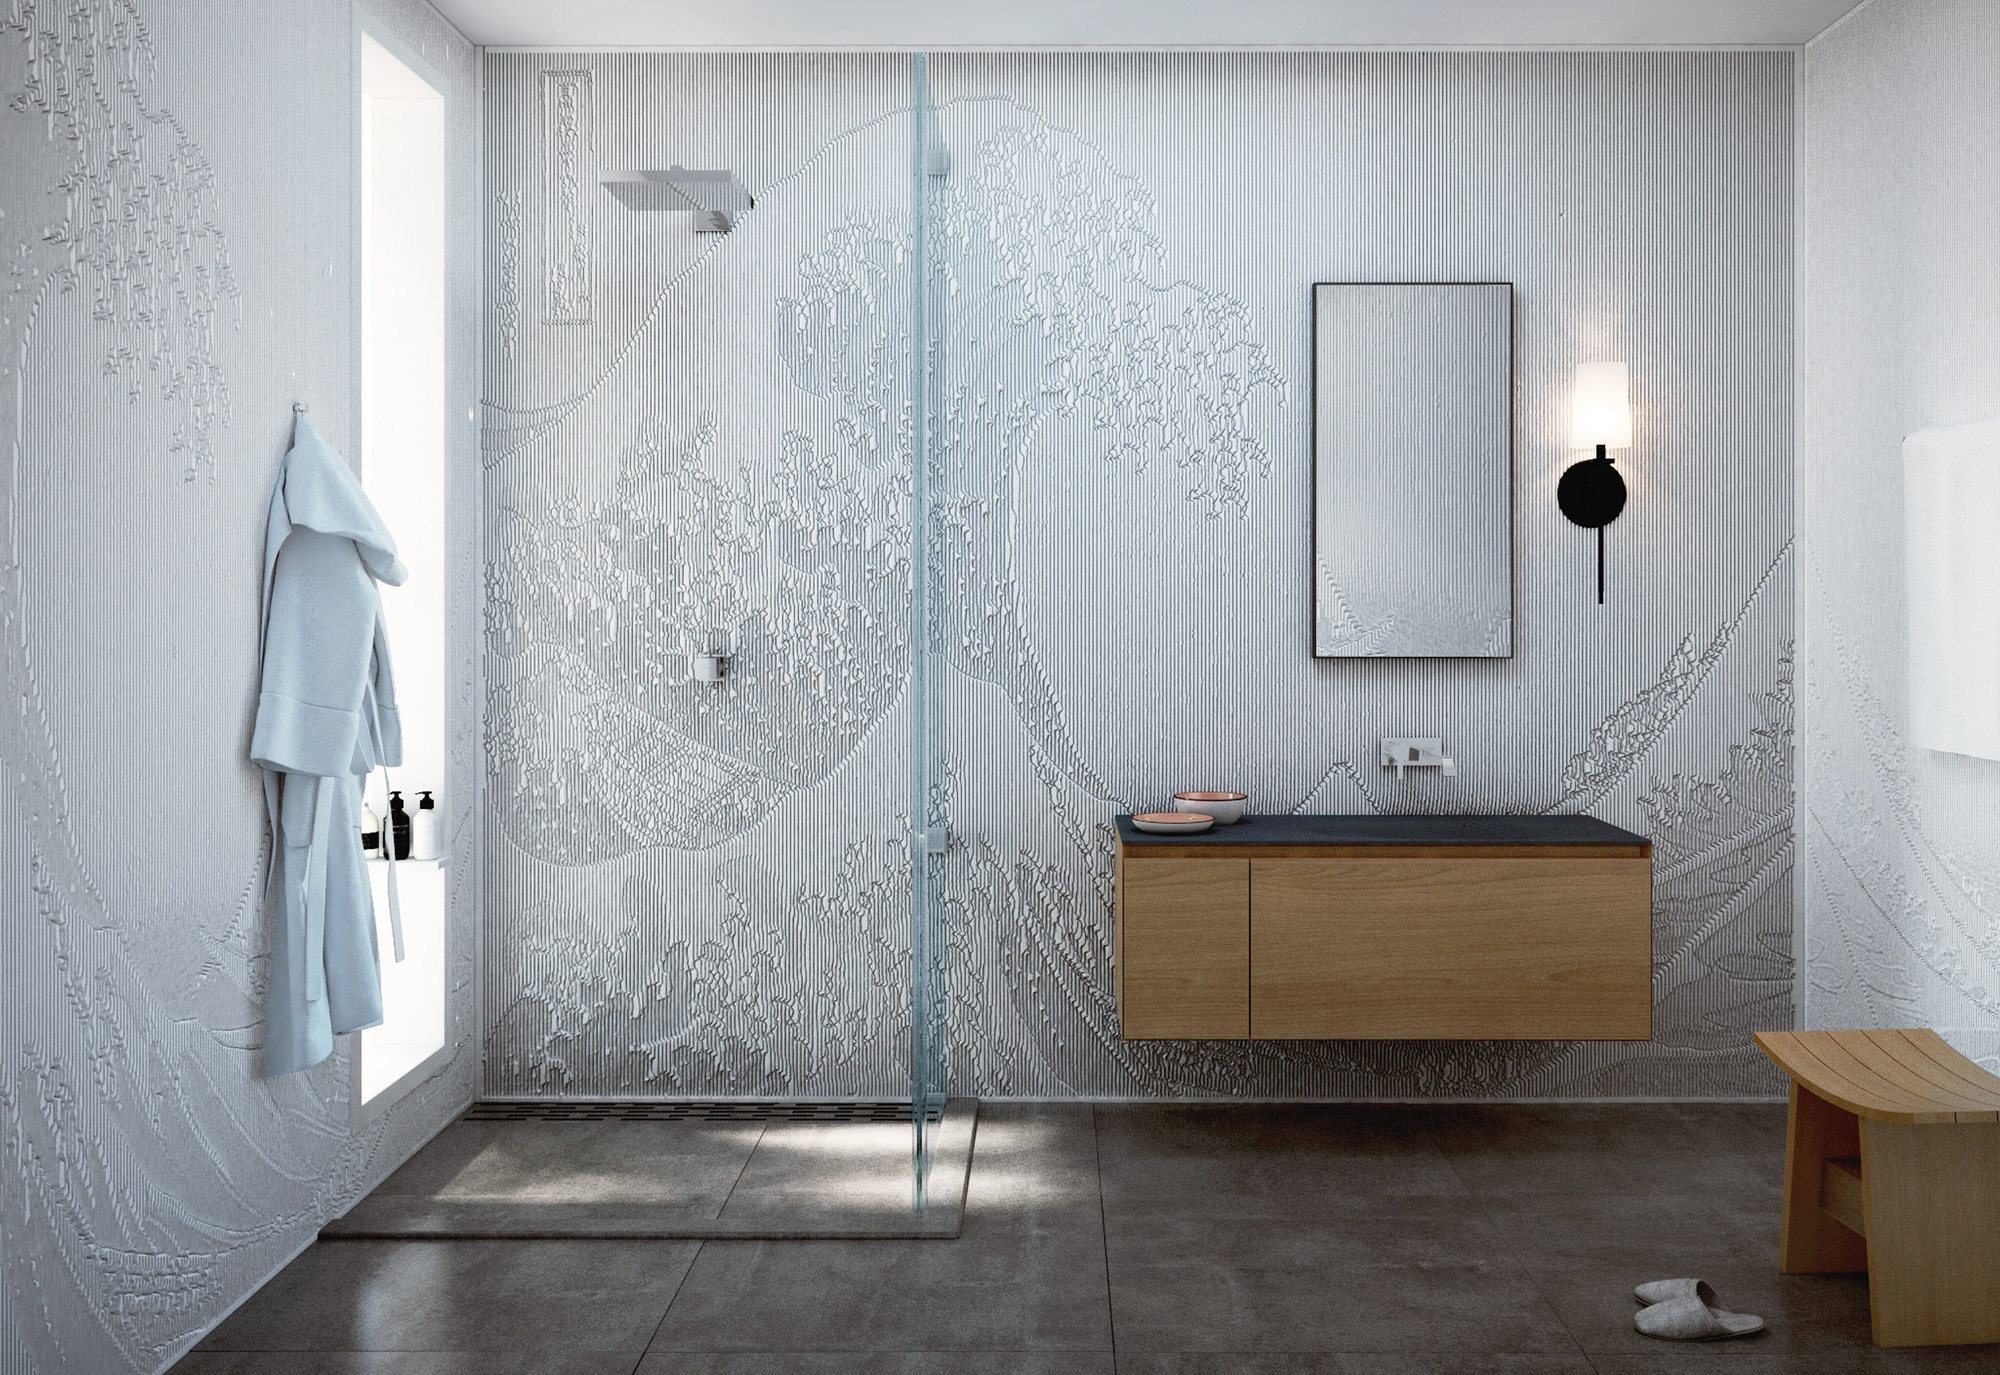 Pin By Mario Romano On Interior Space Corian Shower Walls Corian Wall Panels